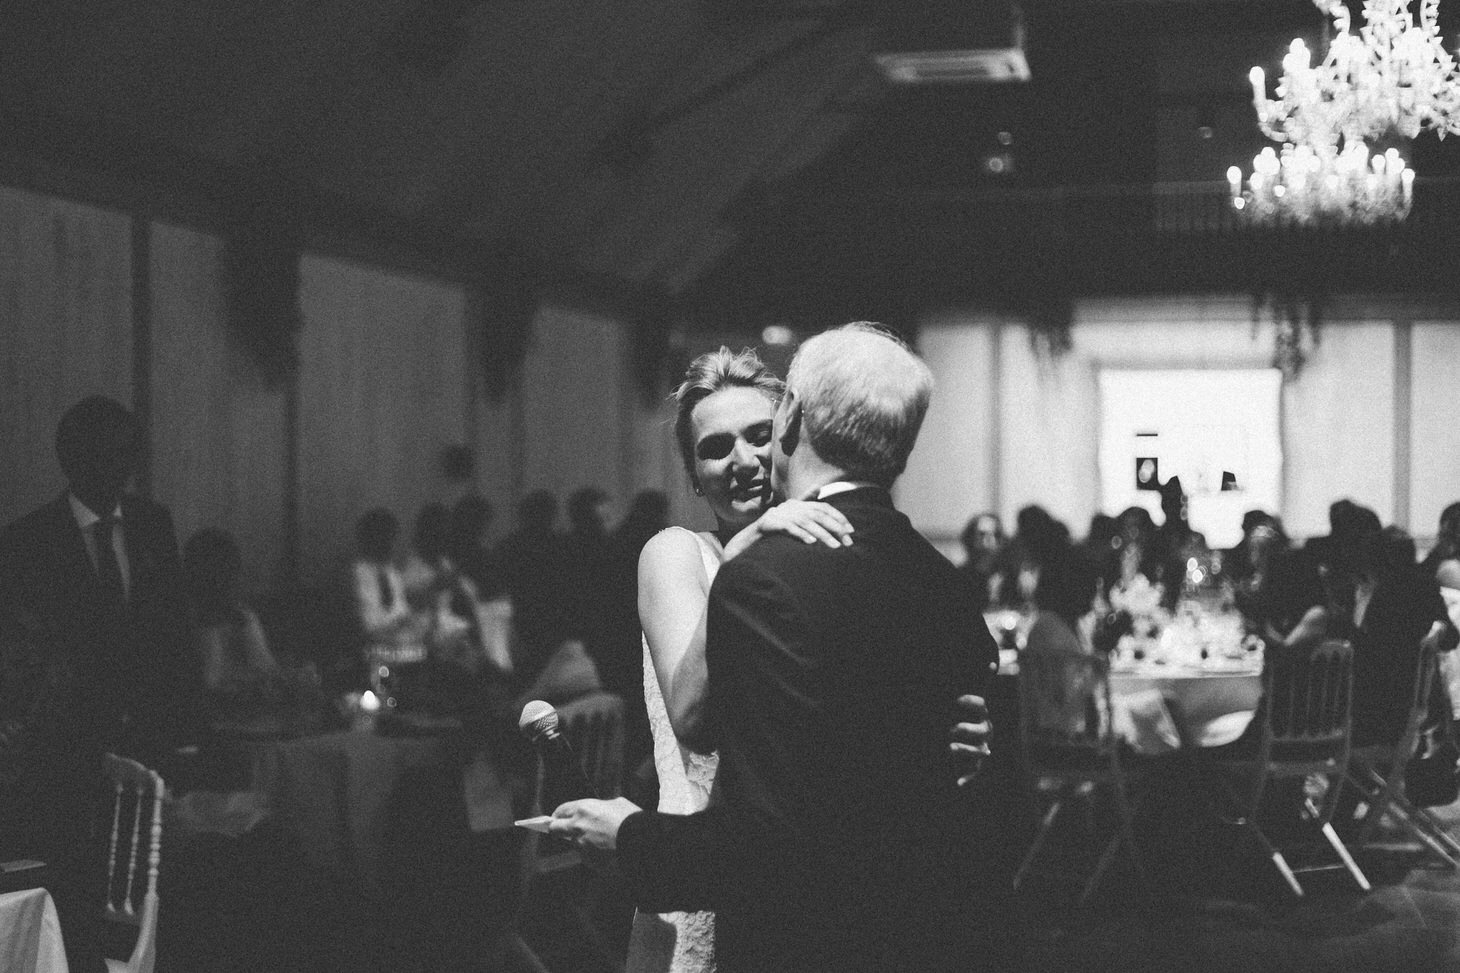 photographe-mariage-paris-montfort-l-amaury-095